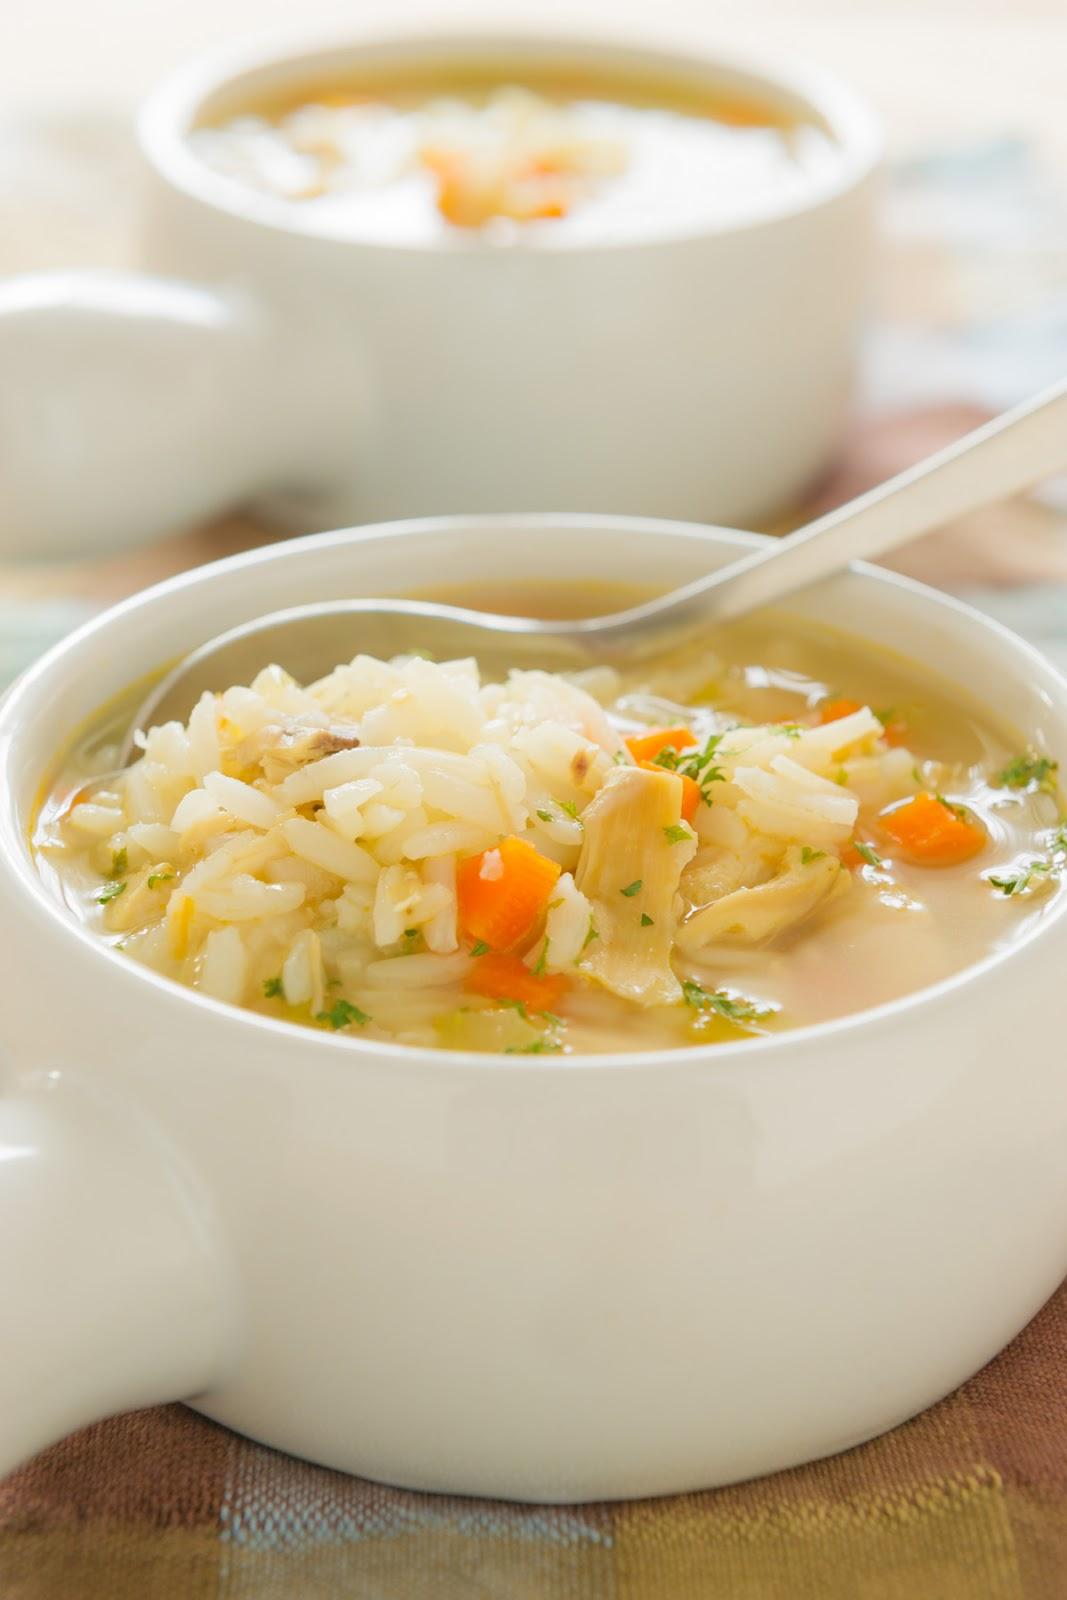 Skinny Noodles Shirataki Chicken Or Leftover Turkey